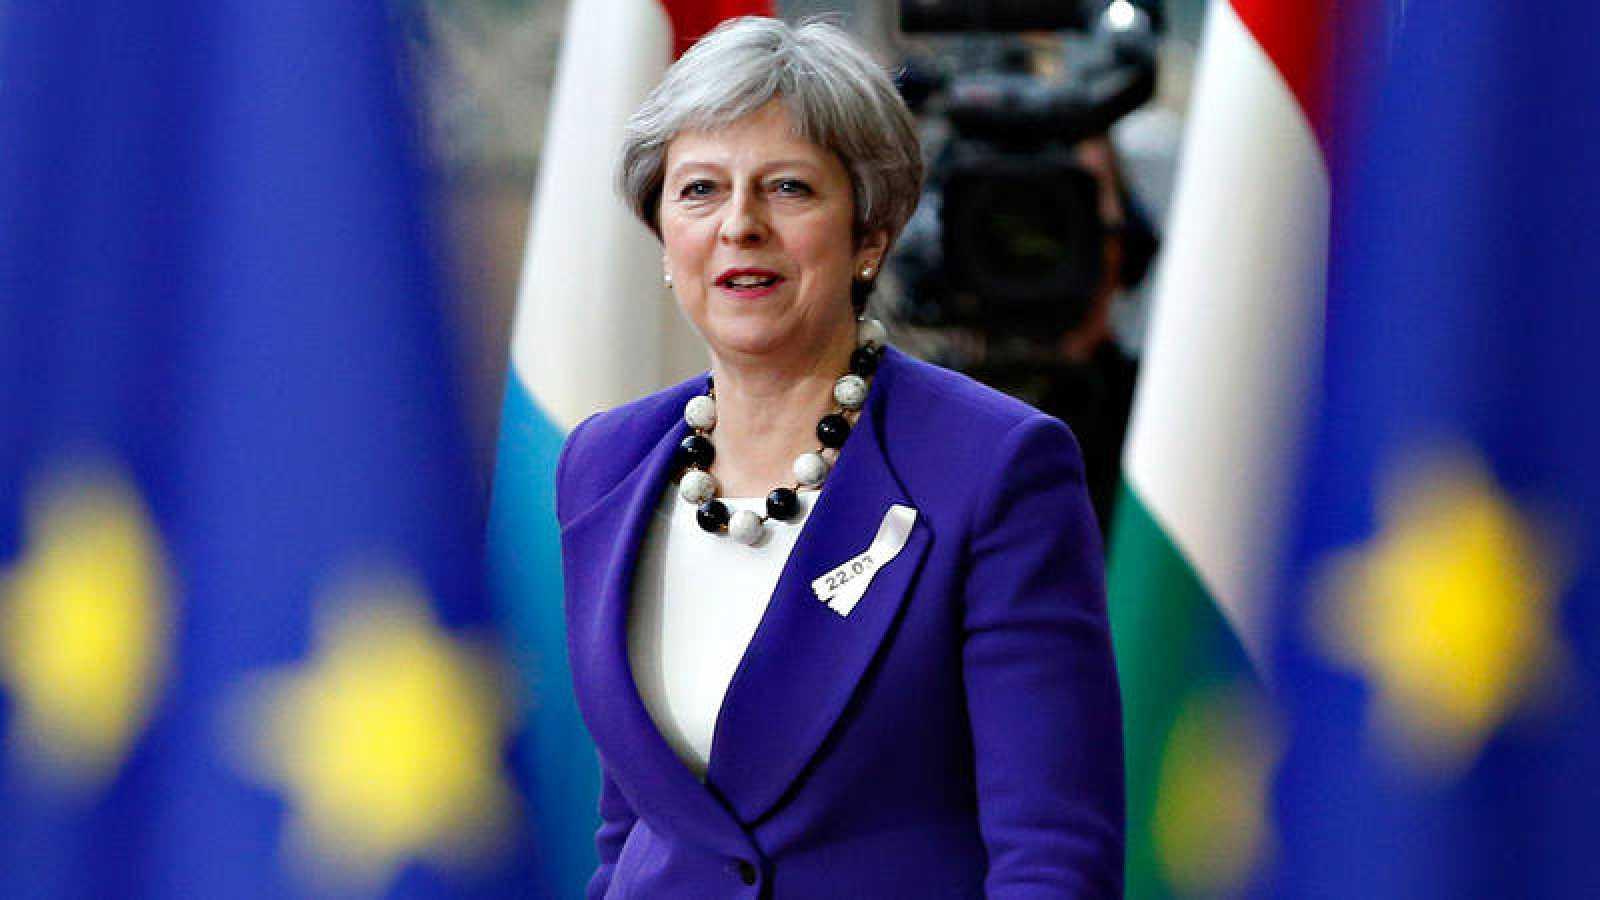 La primera ministra británica, Theresa May, a su llegada a la cumbre de Bruselas